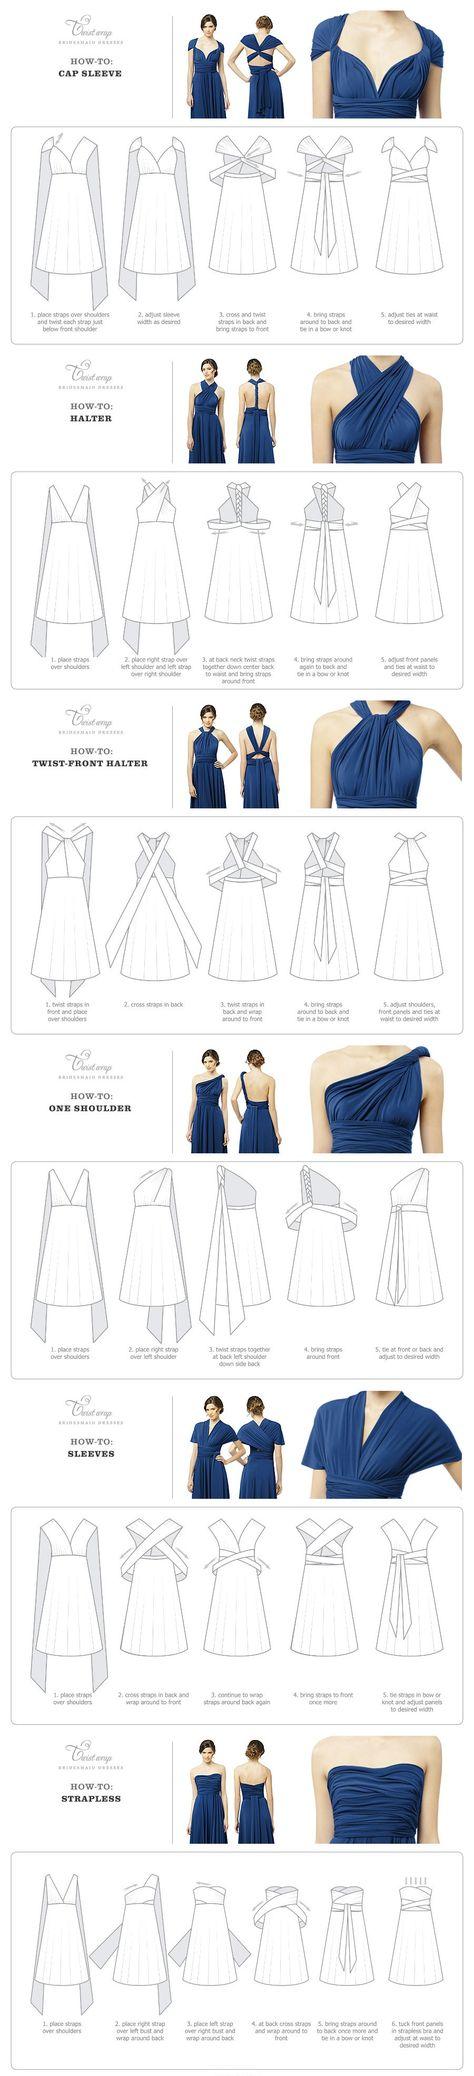 Infinity Dress On Pinterest 43 Pins